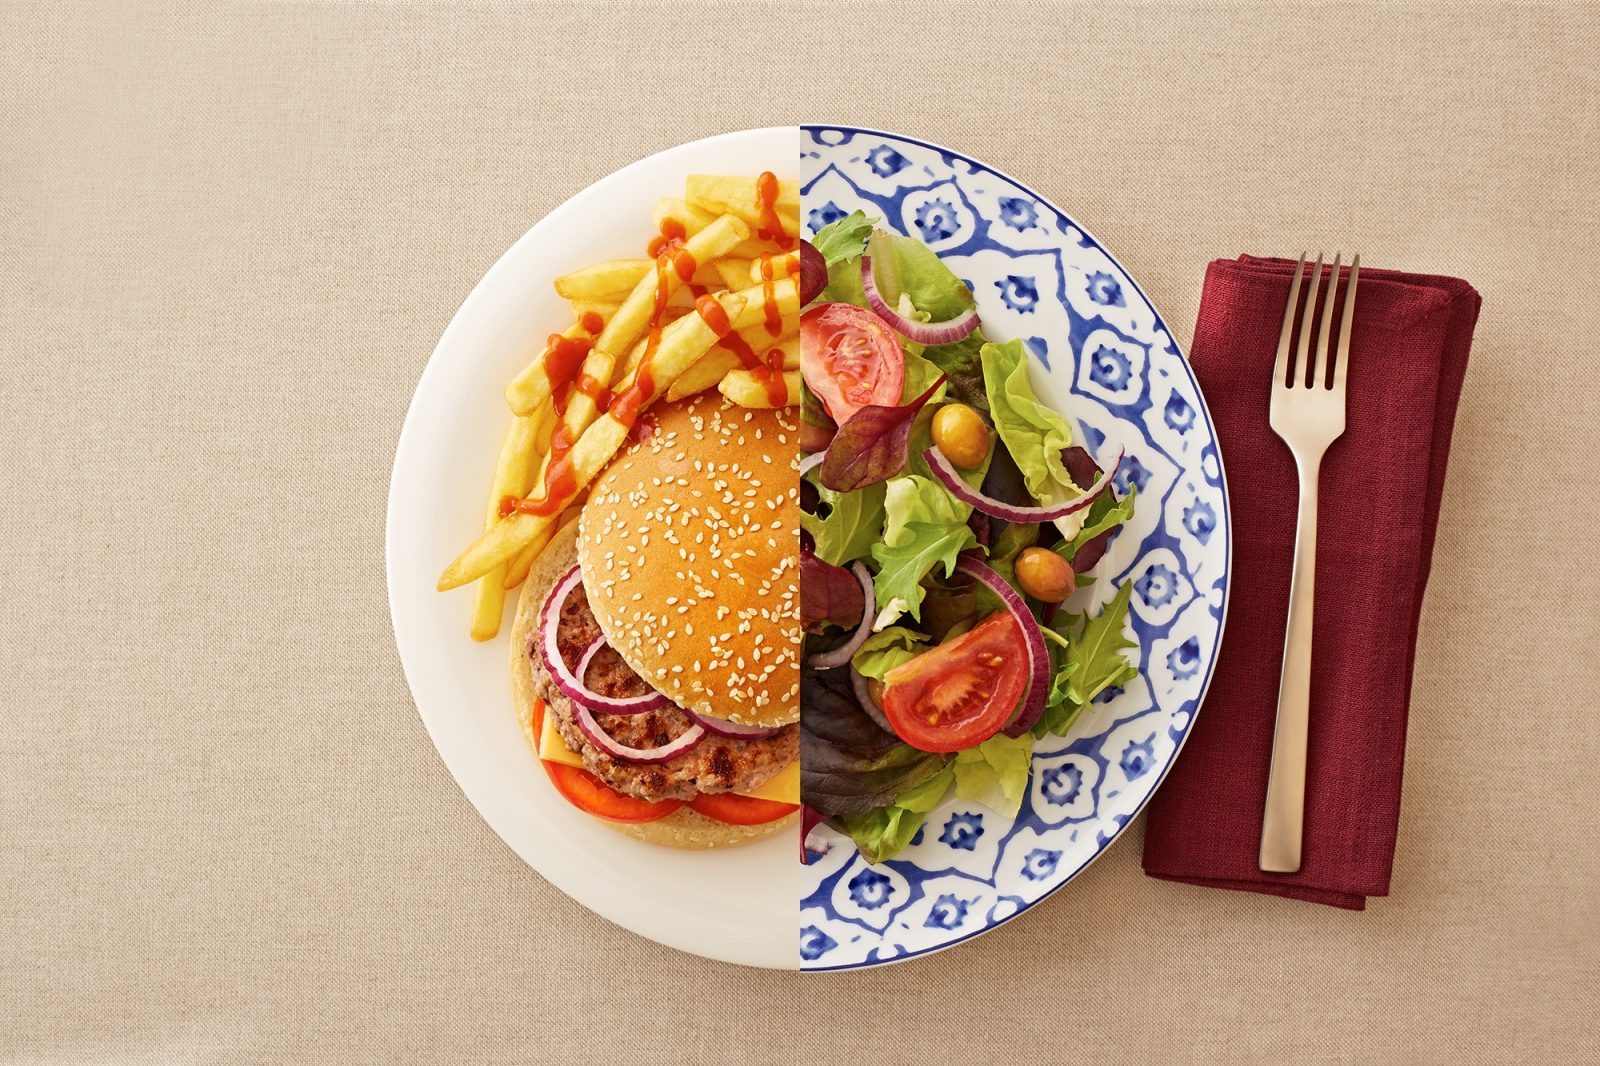 Тарелка в которой лежит: картошка фри, гамбургер, салат из зелени